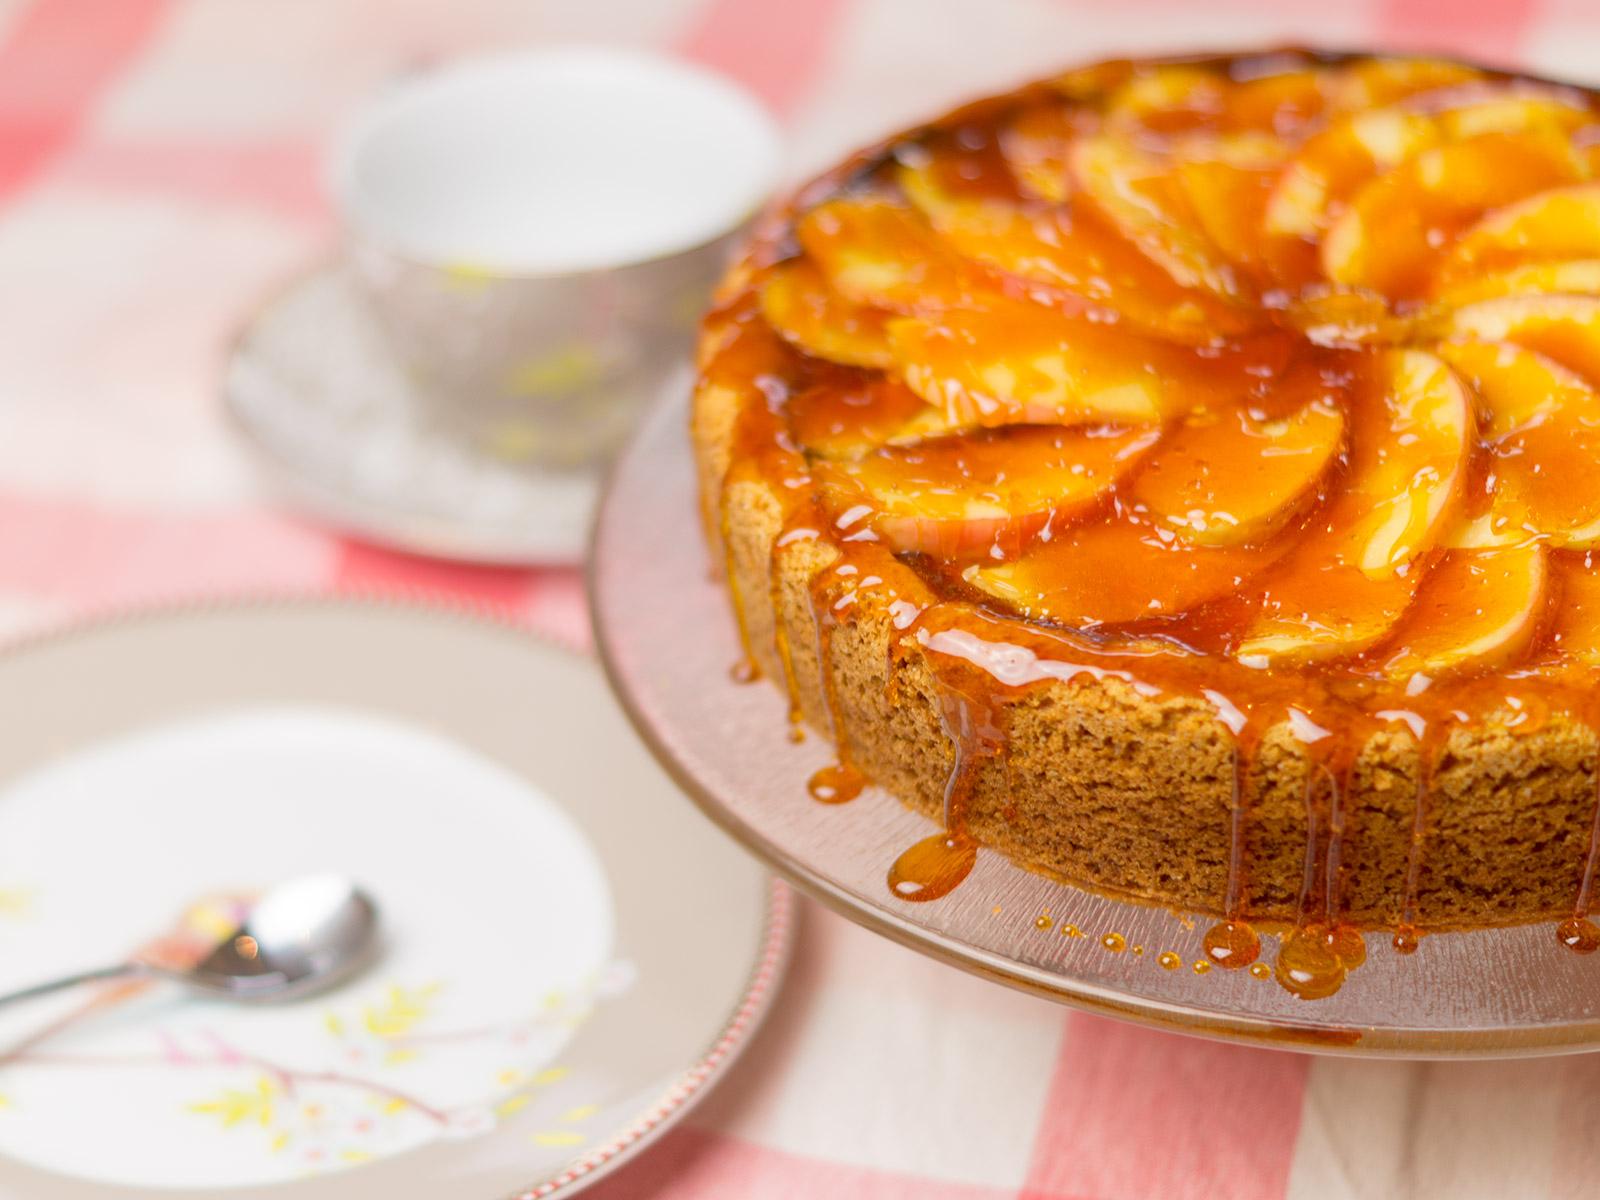 Apfel Karamell Kasekuchen Ruf Lebensmittel